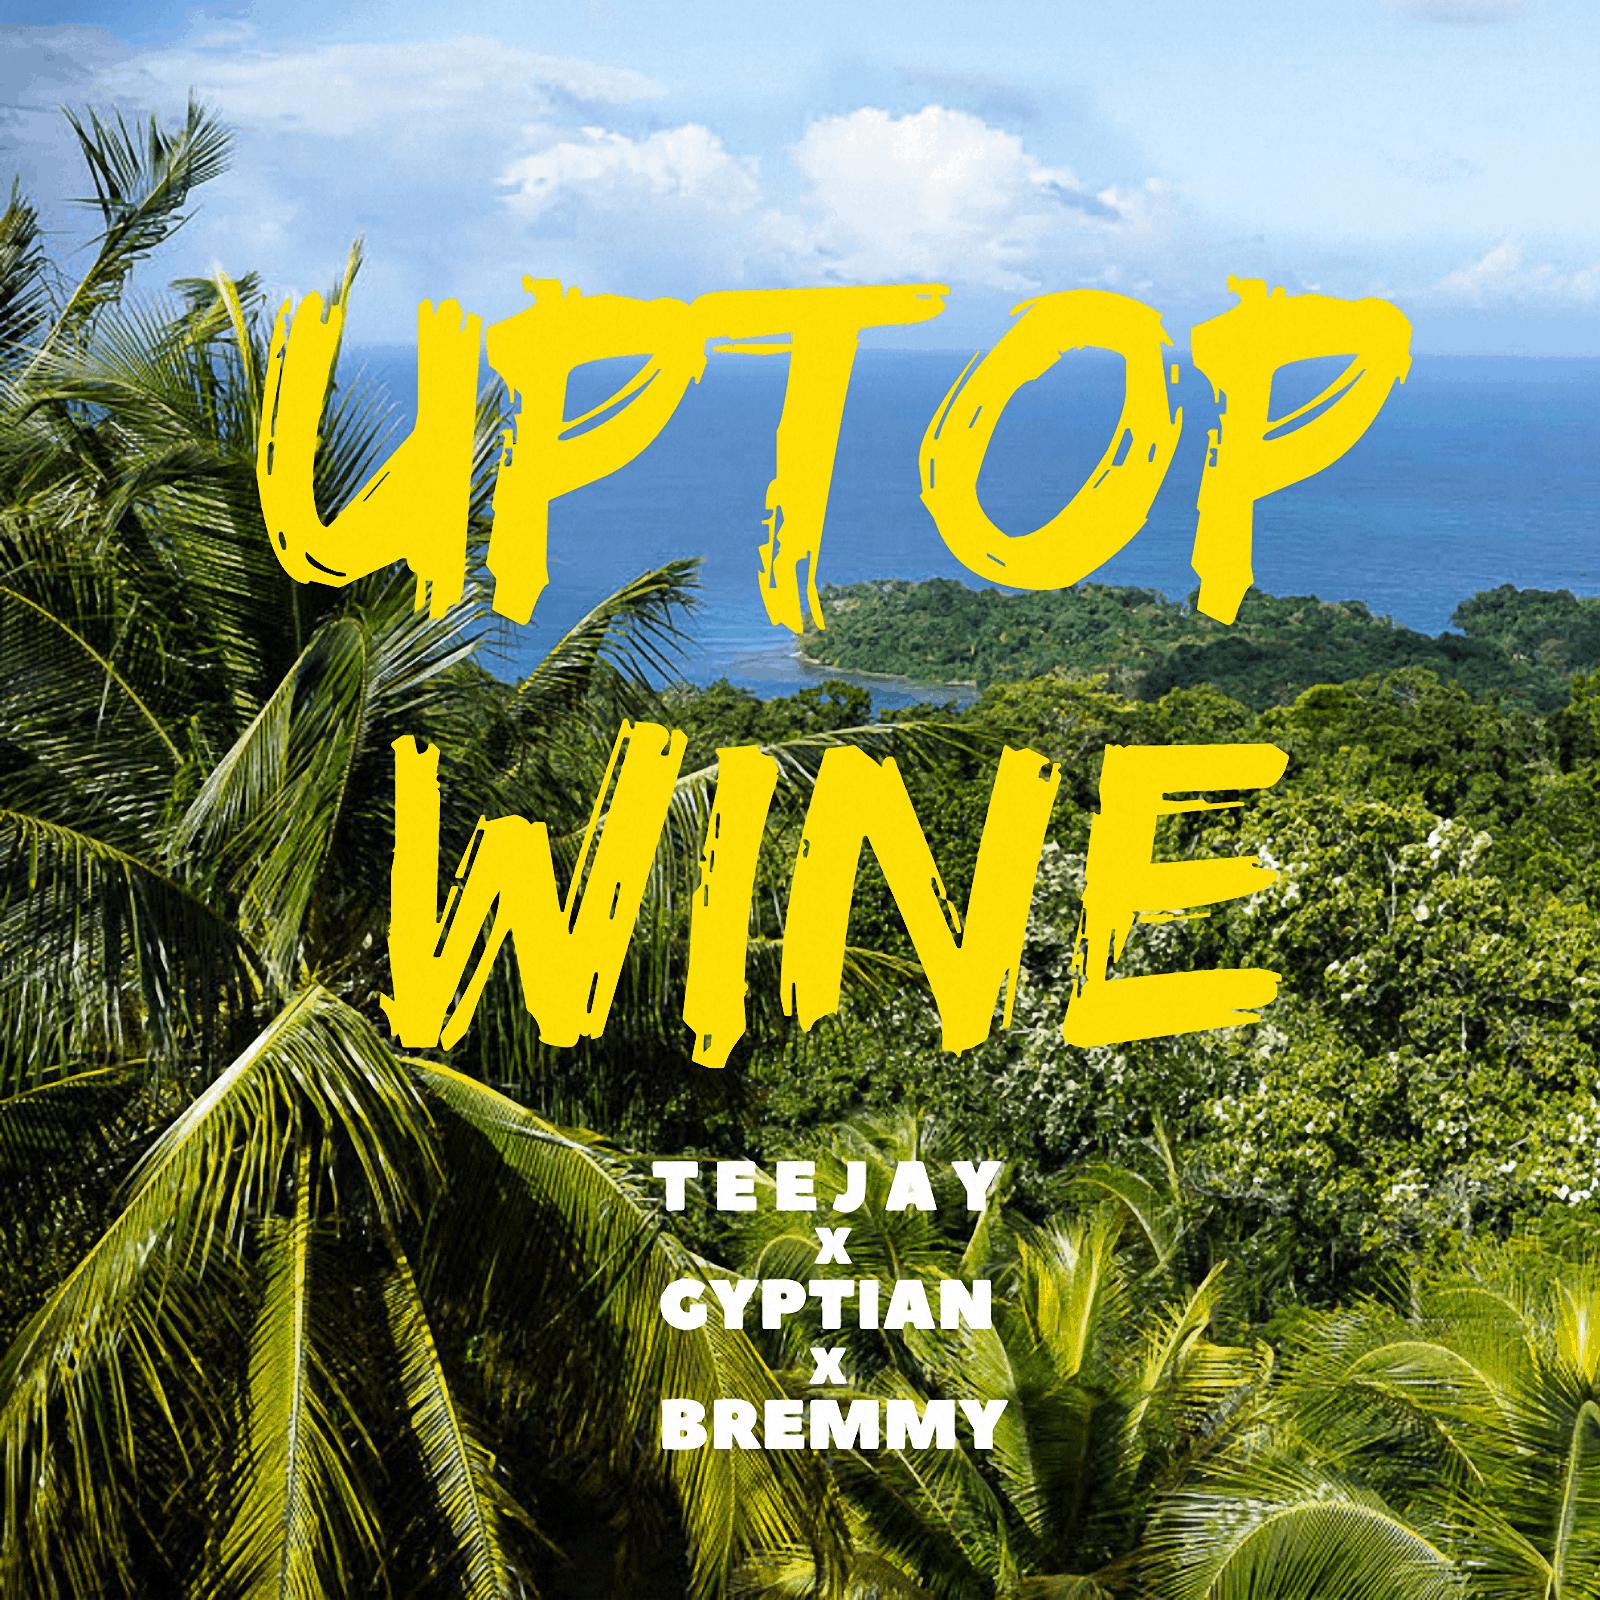 UPTOP WINE - TEEJAY FT. GYPTAIN X BREMMY FZ (TOWER HILL RECORDS)